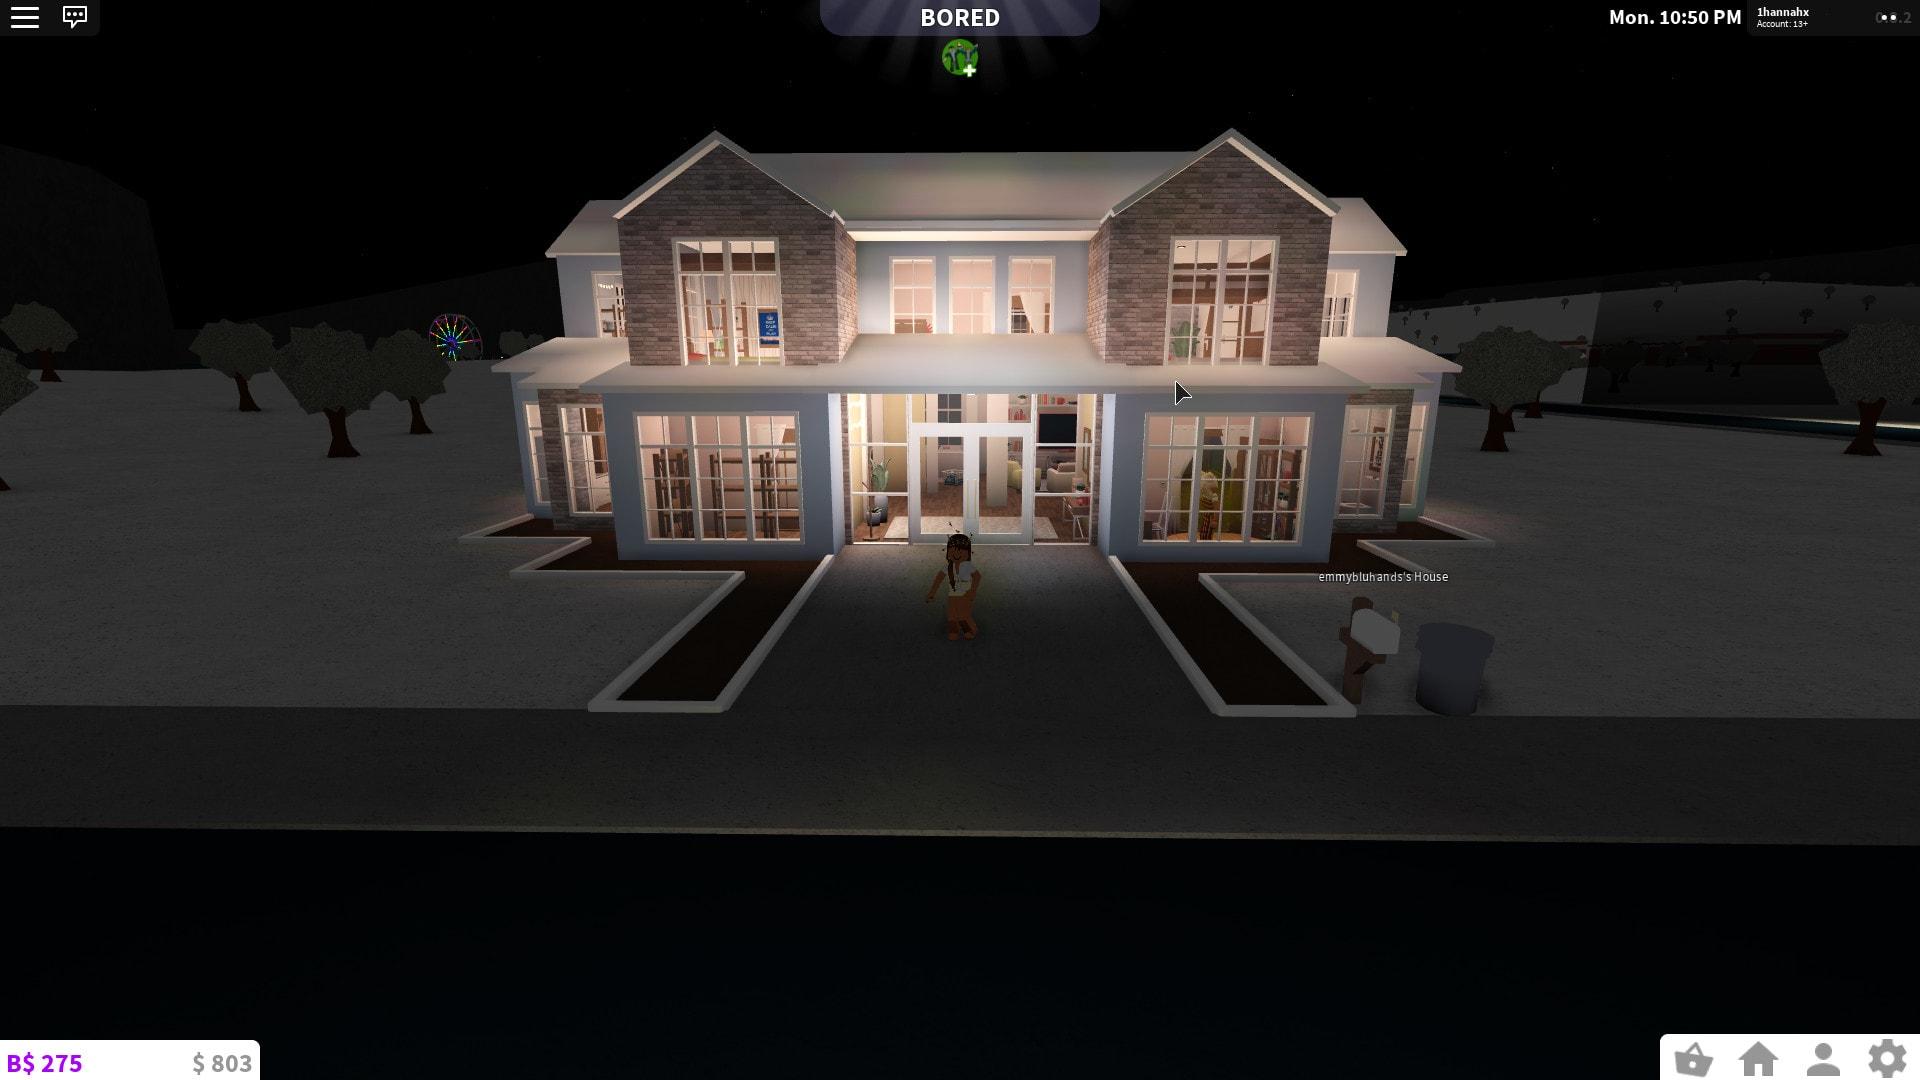 How To Make A Cute House In Bloxburg لم يسبق له مثيل الصور Tier3 Xyz